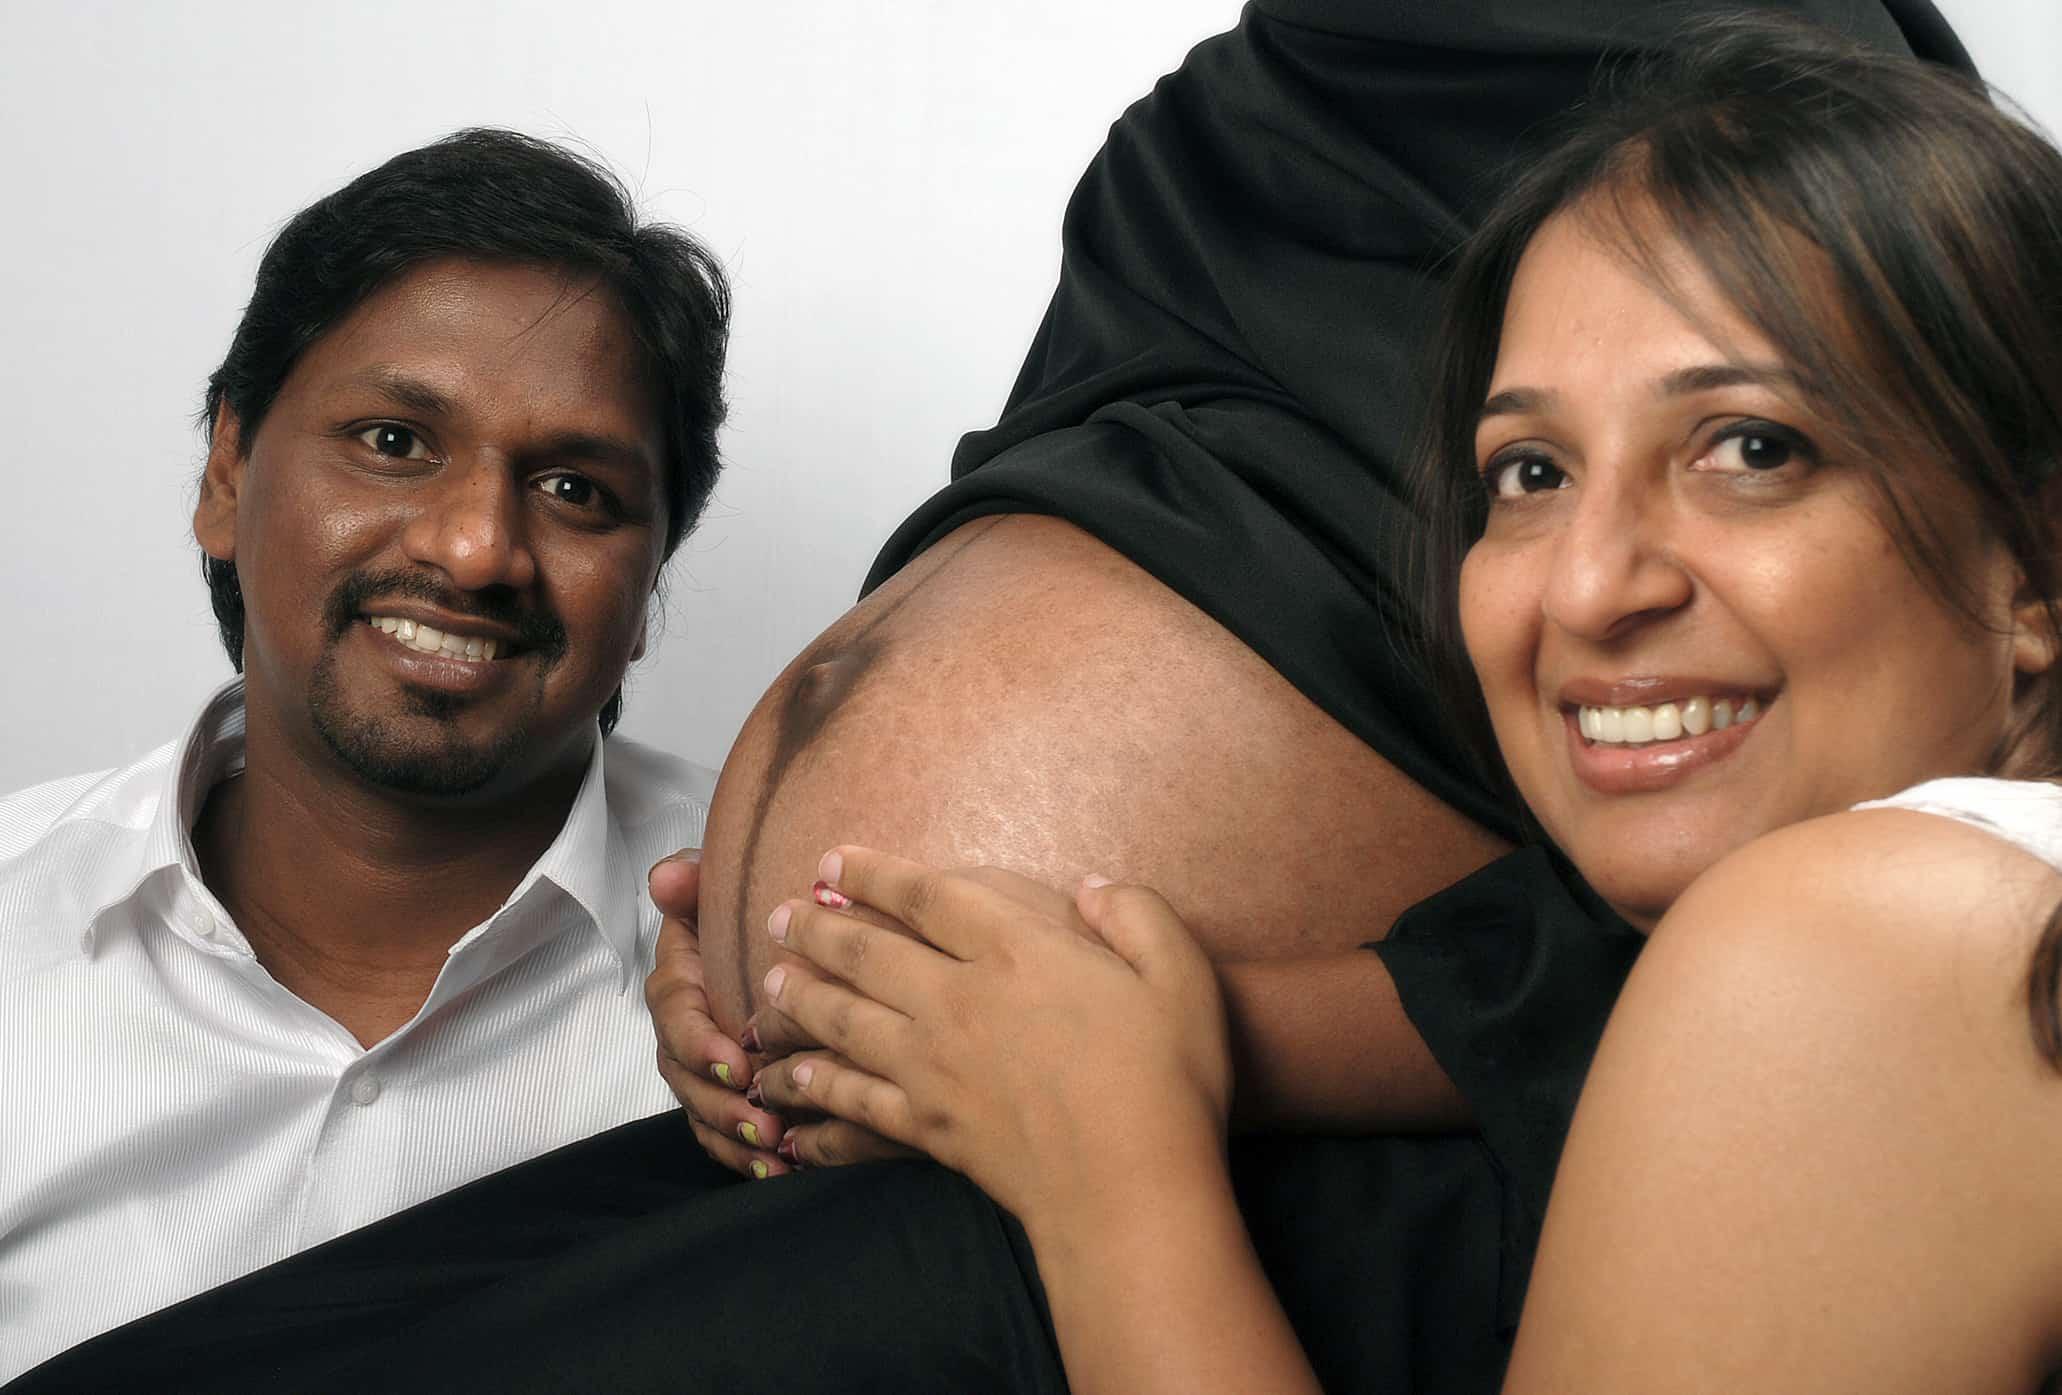 Pregnancy IVF clinic